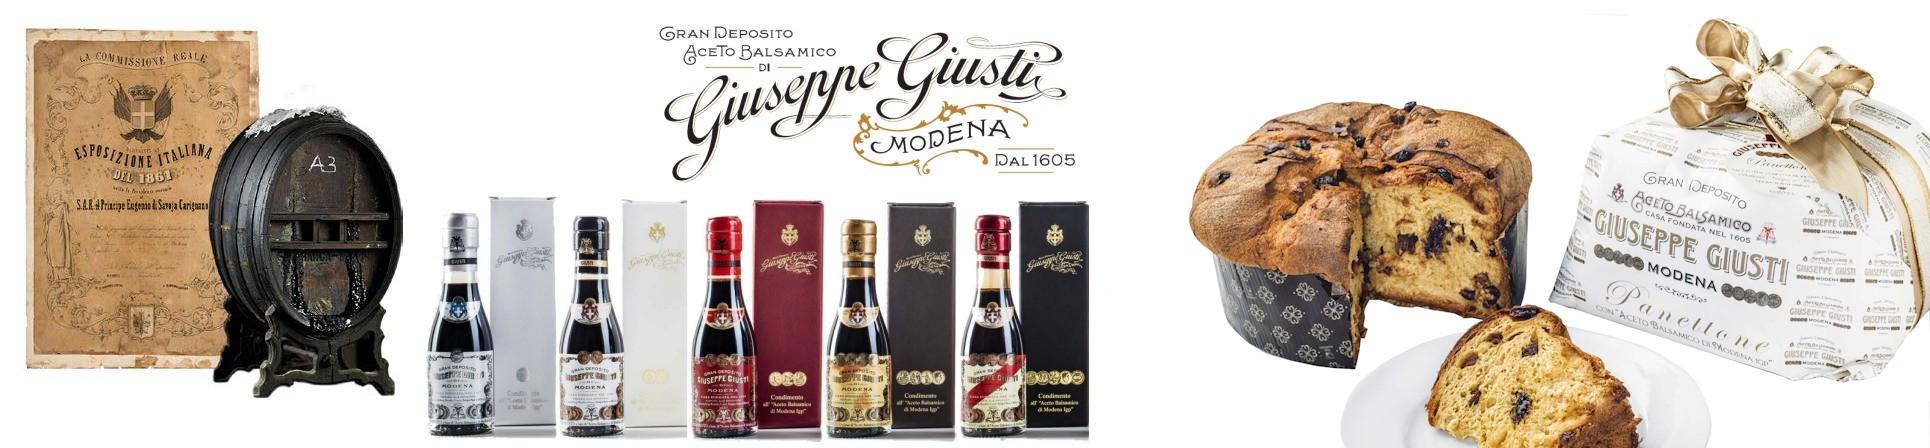 Panettone all'aceto balsamico vendita online - Acetaia Giusti